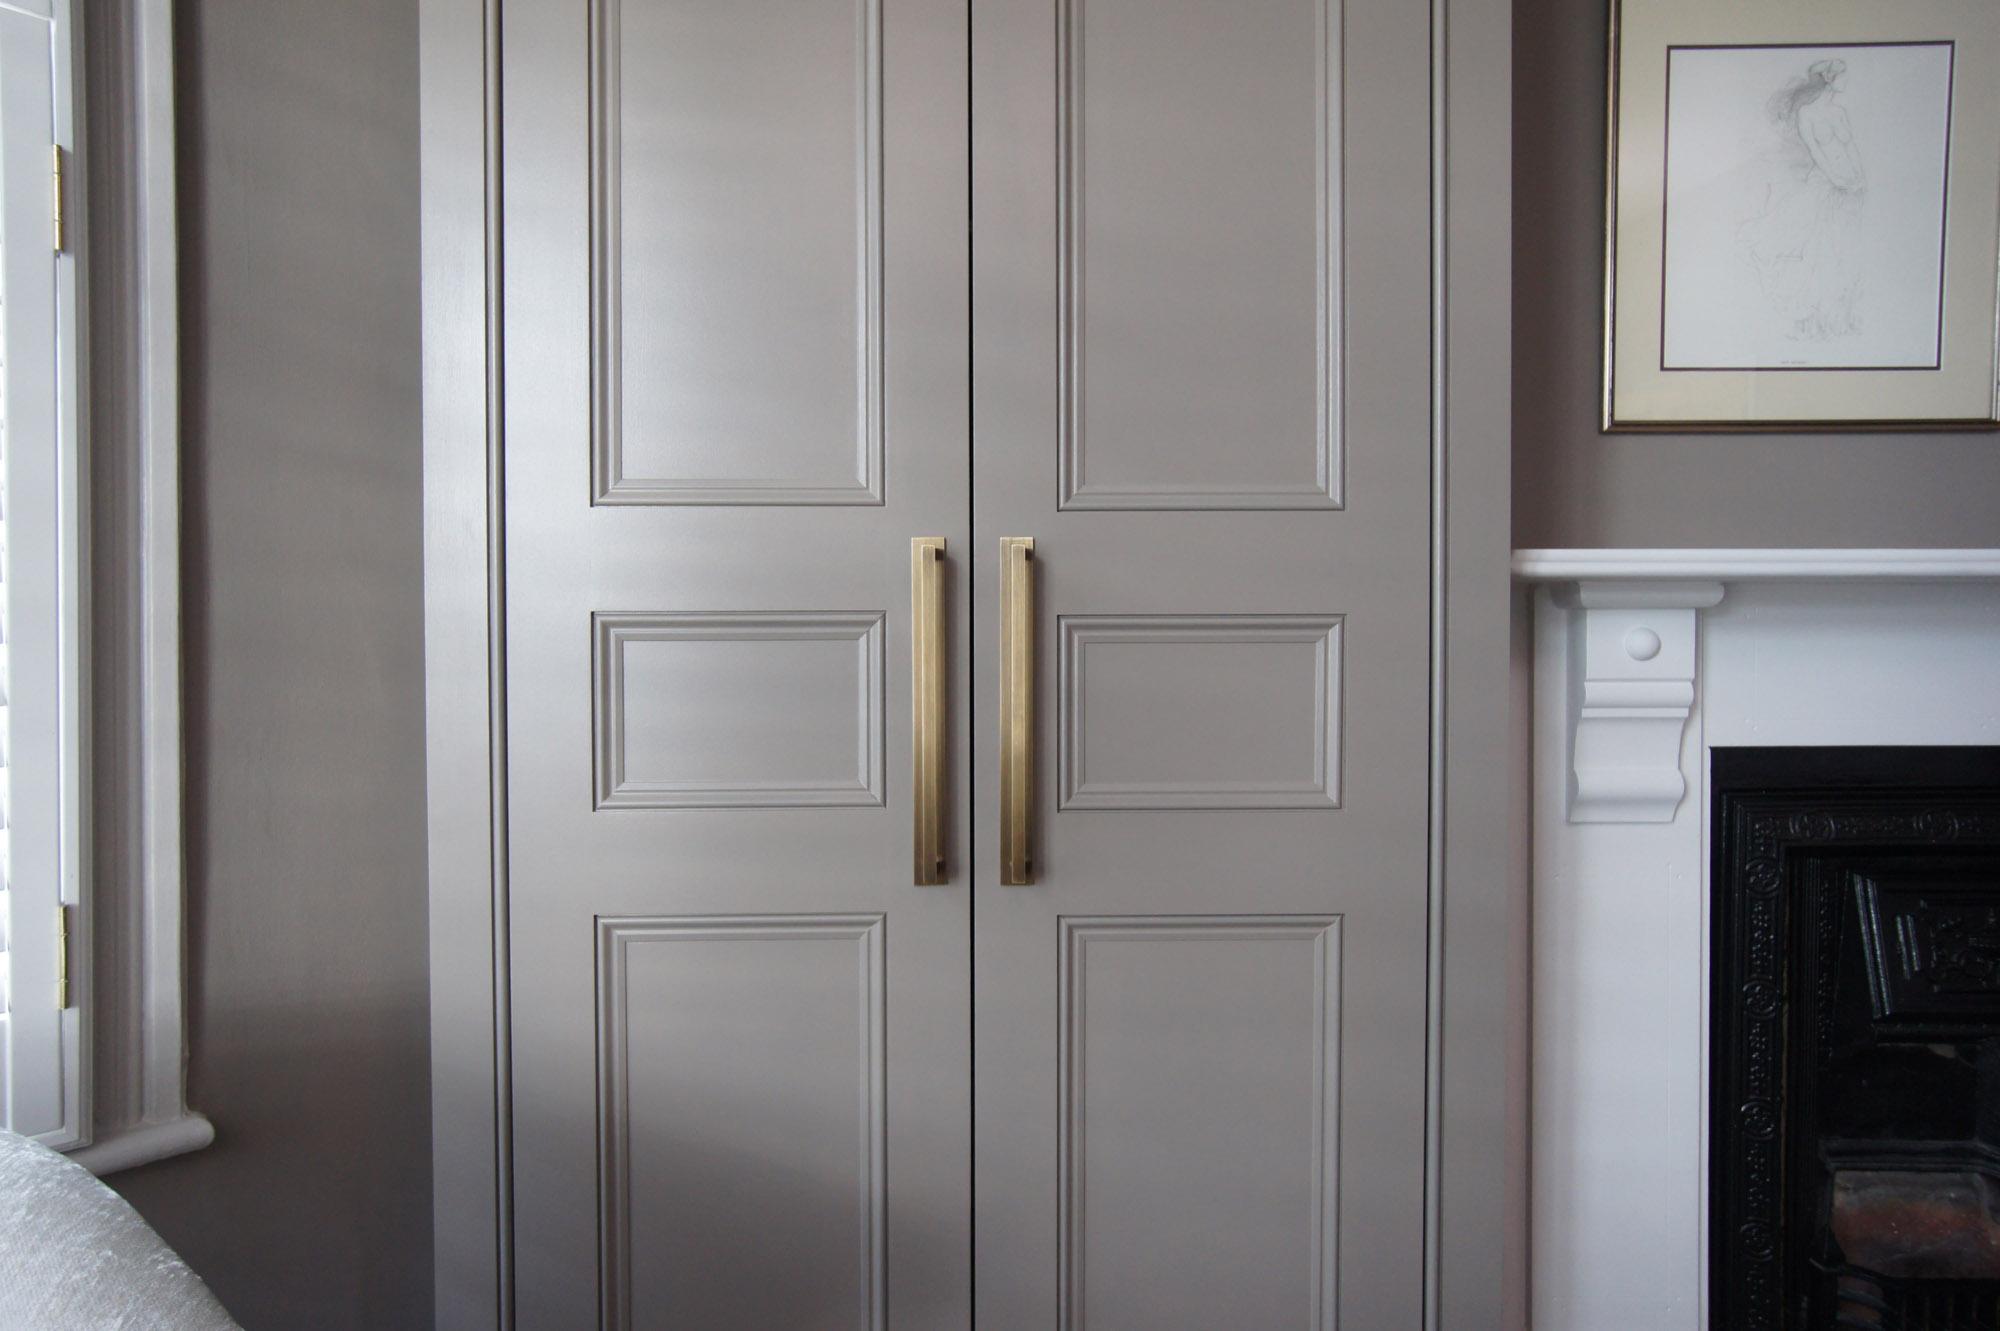 GW-Cabinetry-Interior-Solutions-Wardrobes-1.jpg